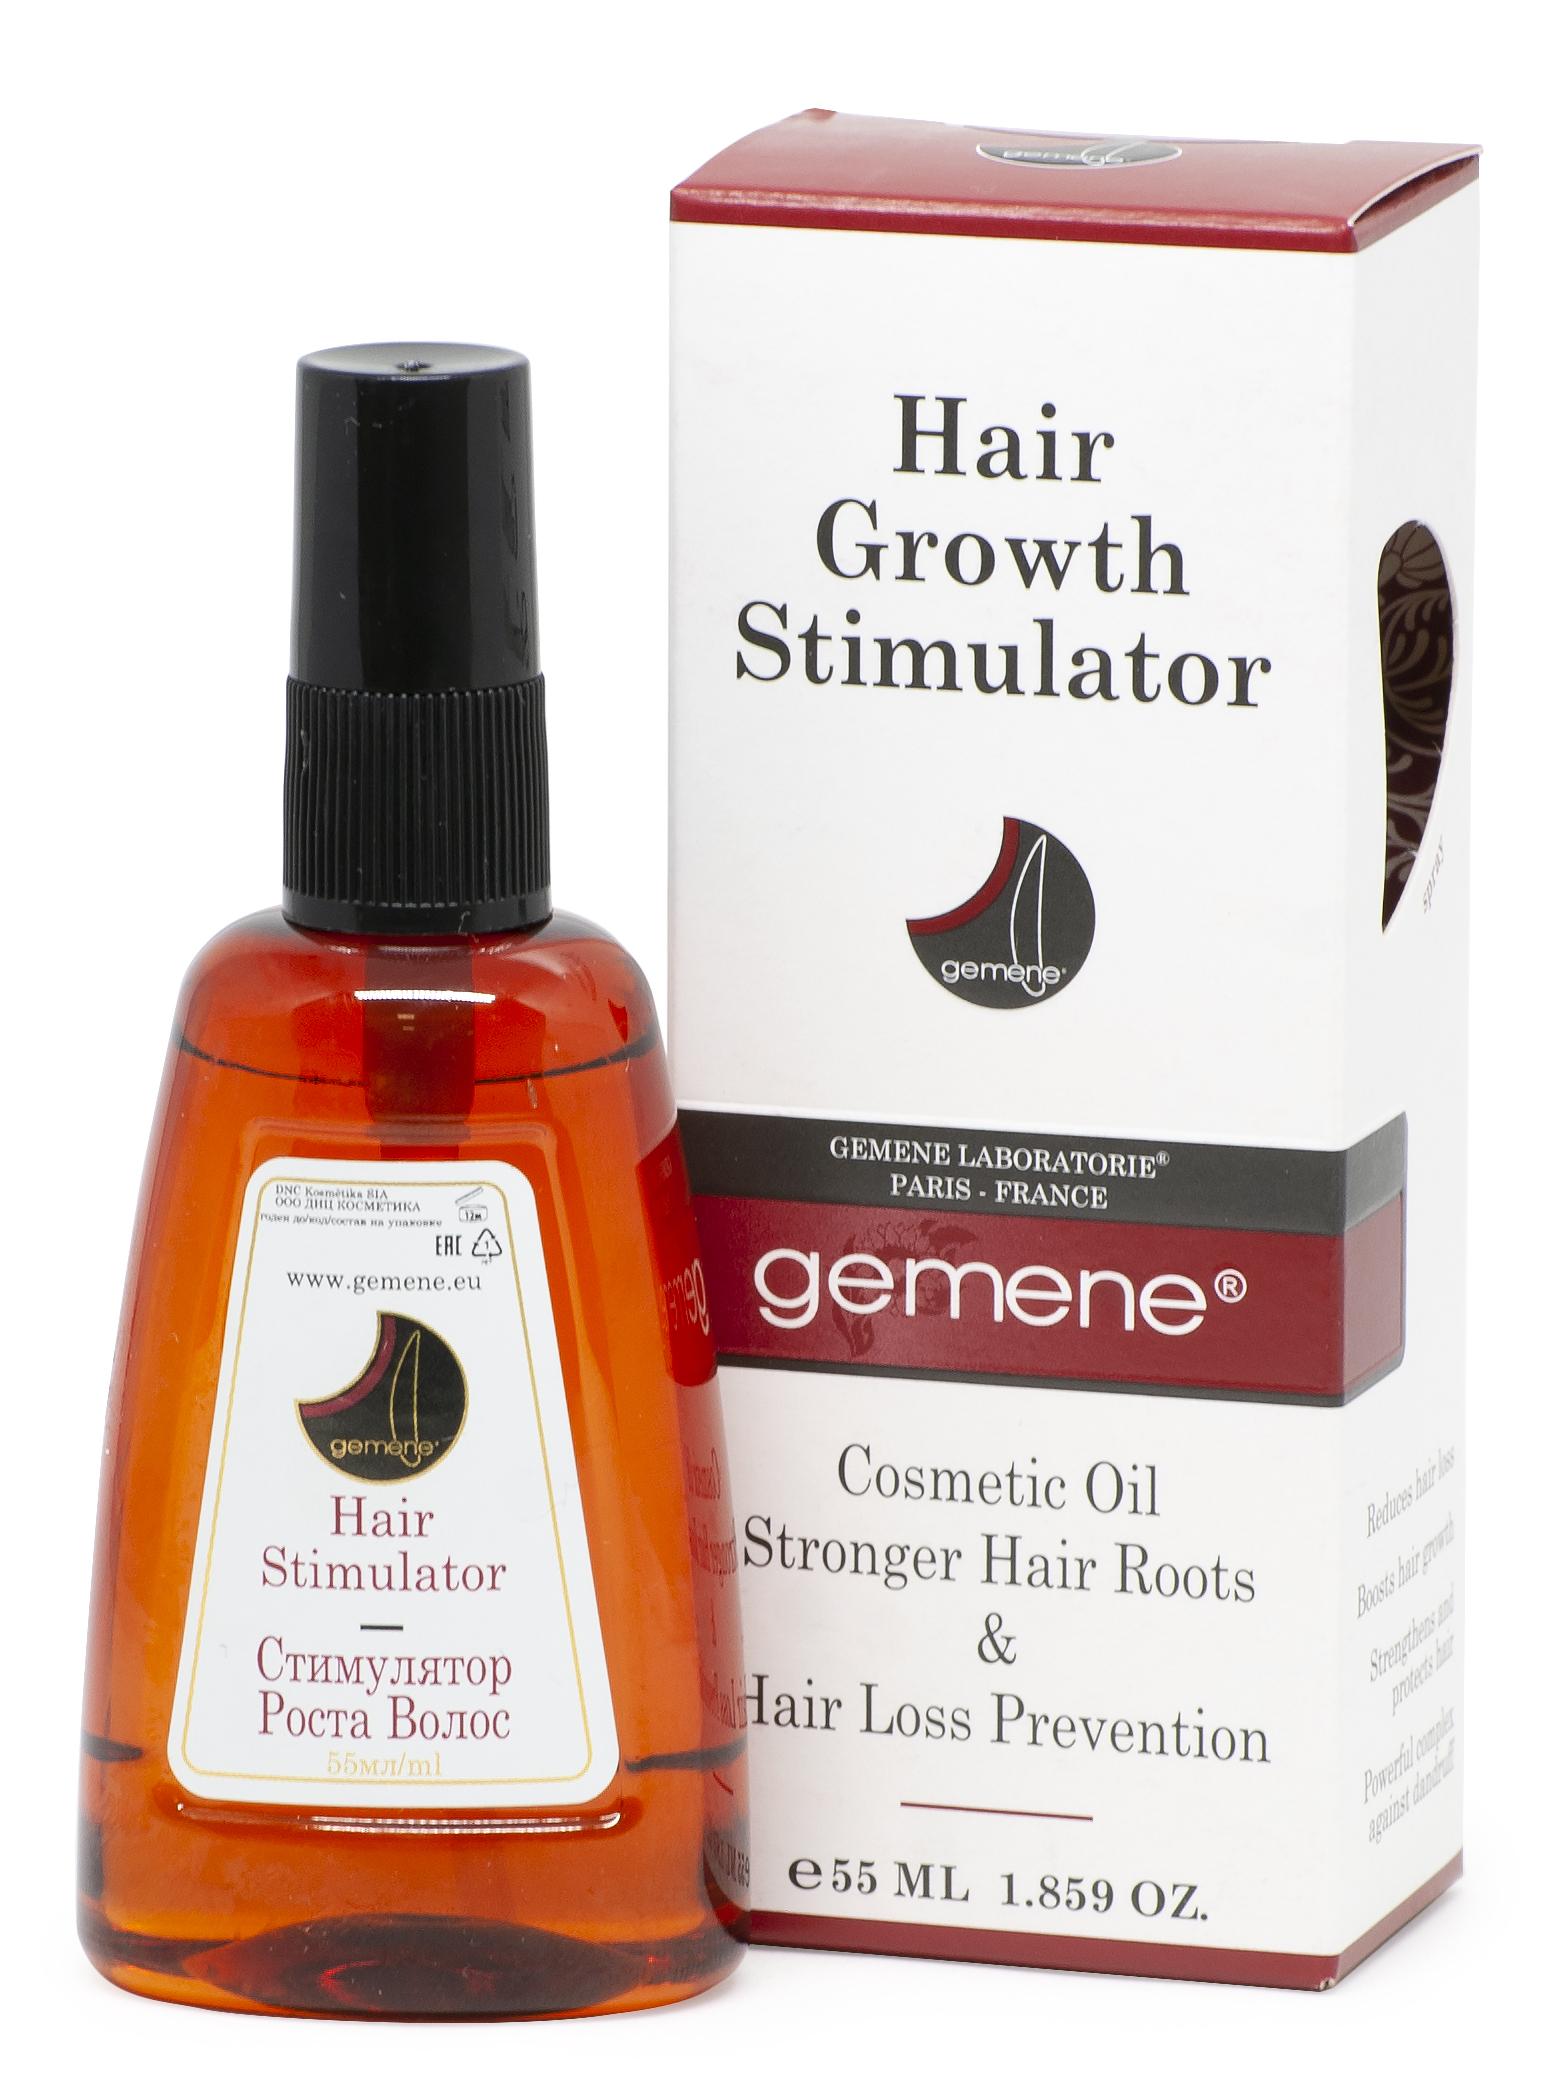 DNC Kosmetika Стимулятор роста. Масло для корней волос против выпадения, 55 мл (DNC Kosmetika, Gemene) ducray неоптид лосьон от выпадения волос для мужчин 100 мл